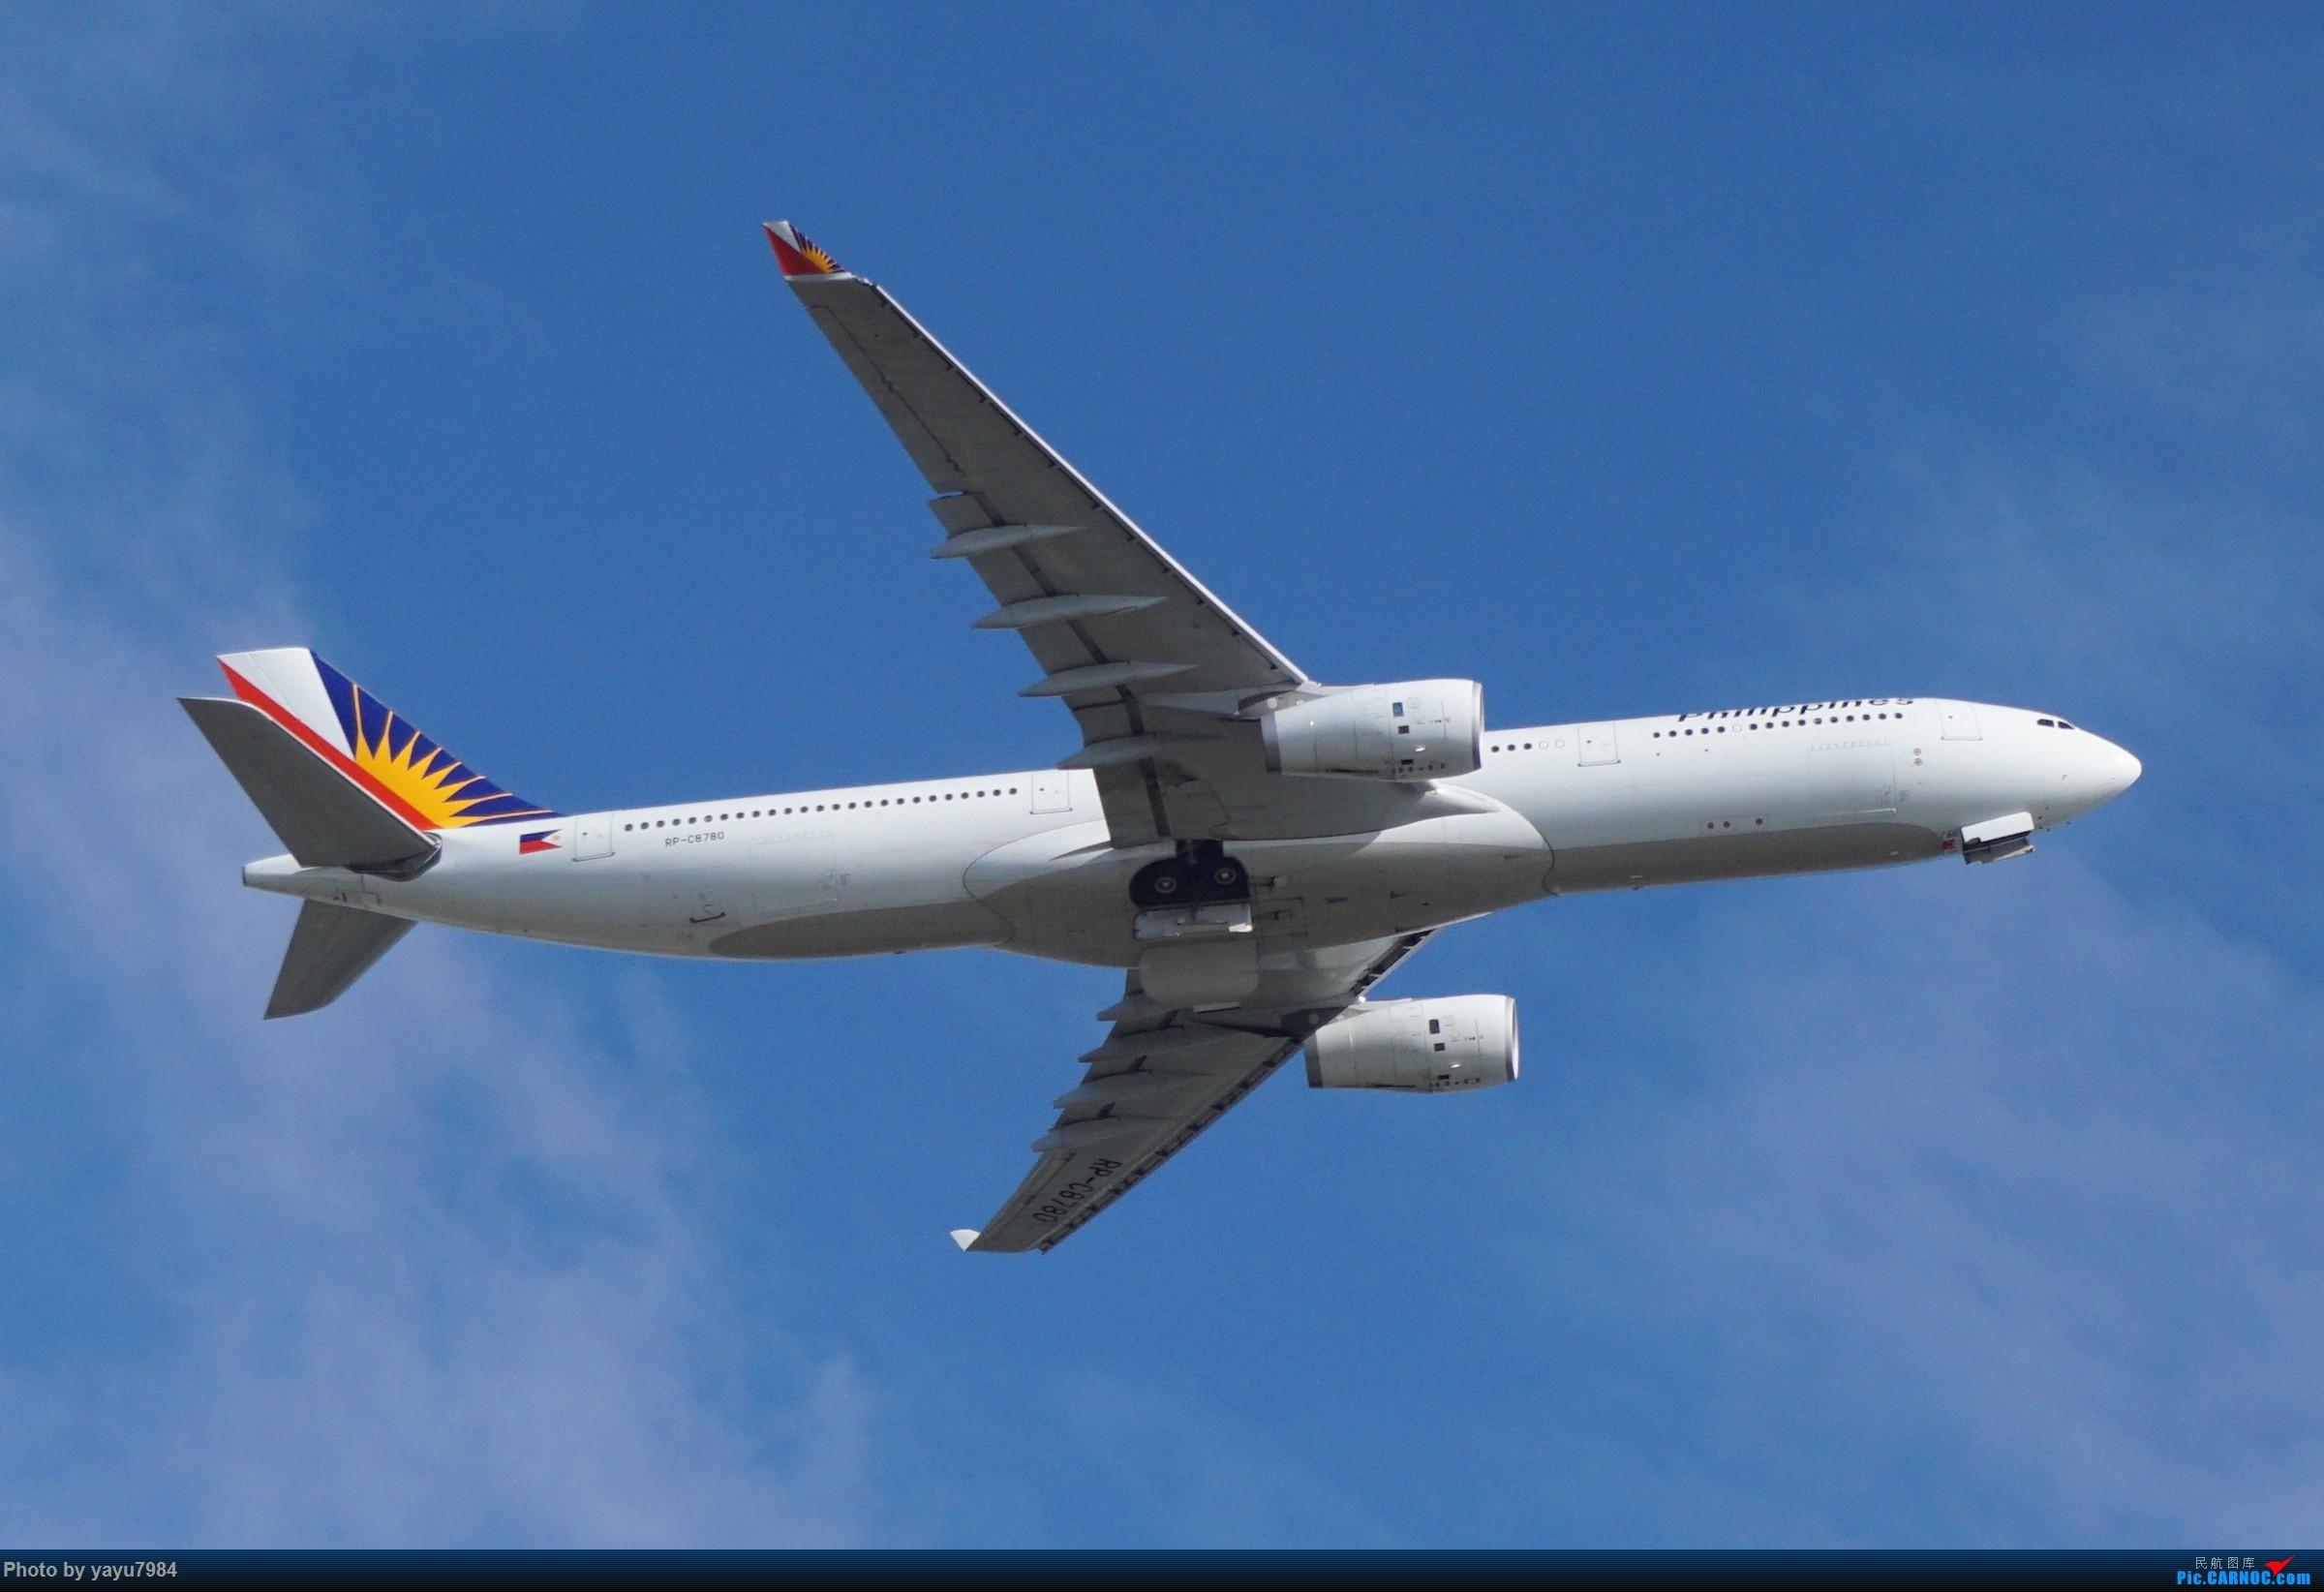 Re:[原创][SYD] 近期随摄,收获颇多 AIRBUS A330-300 RP-C8780 澳大利亚悉尼金斯福德·史密斯机场